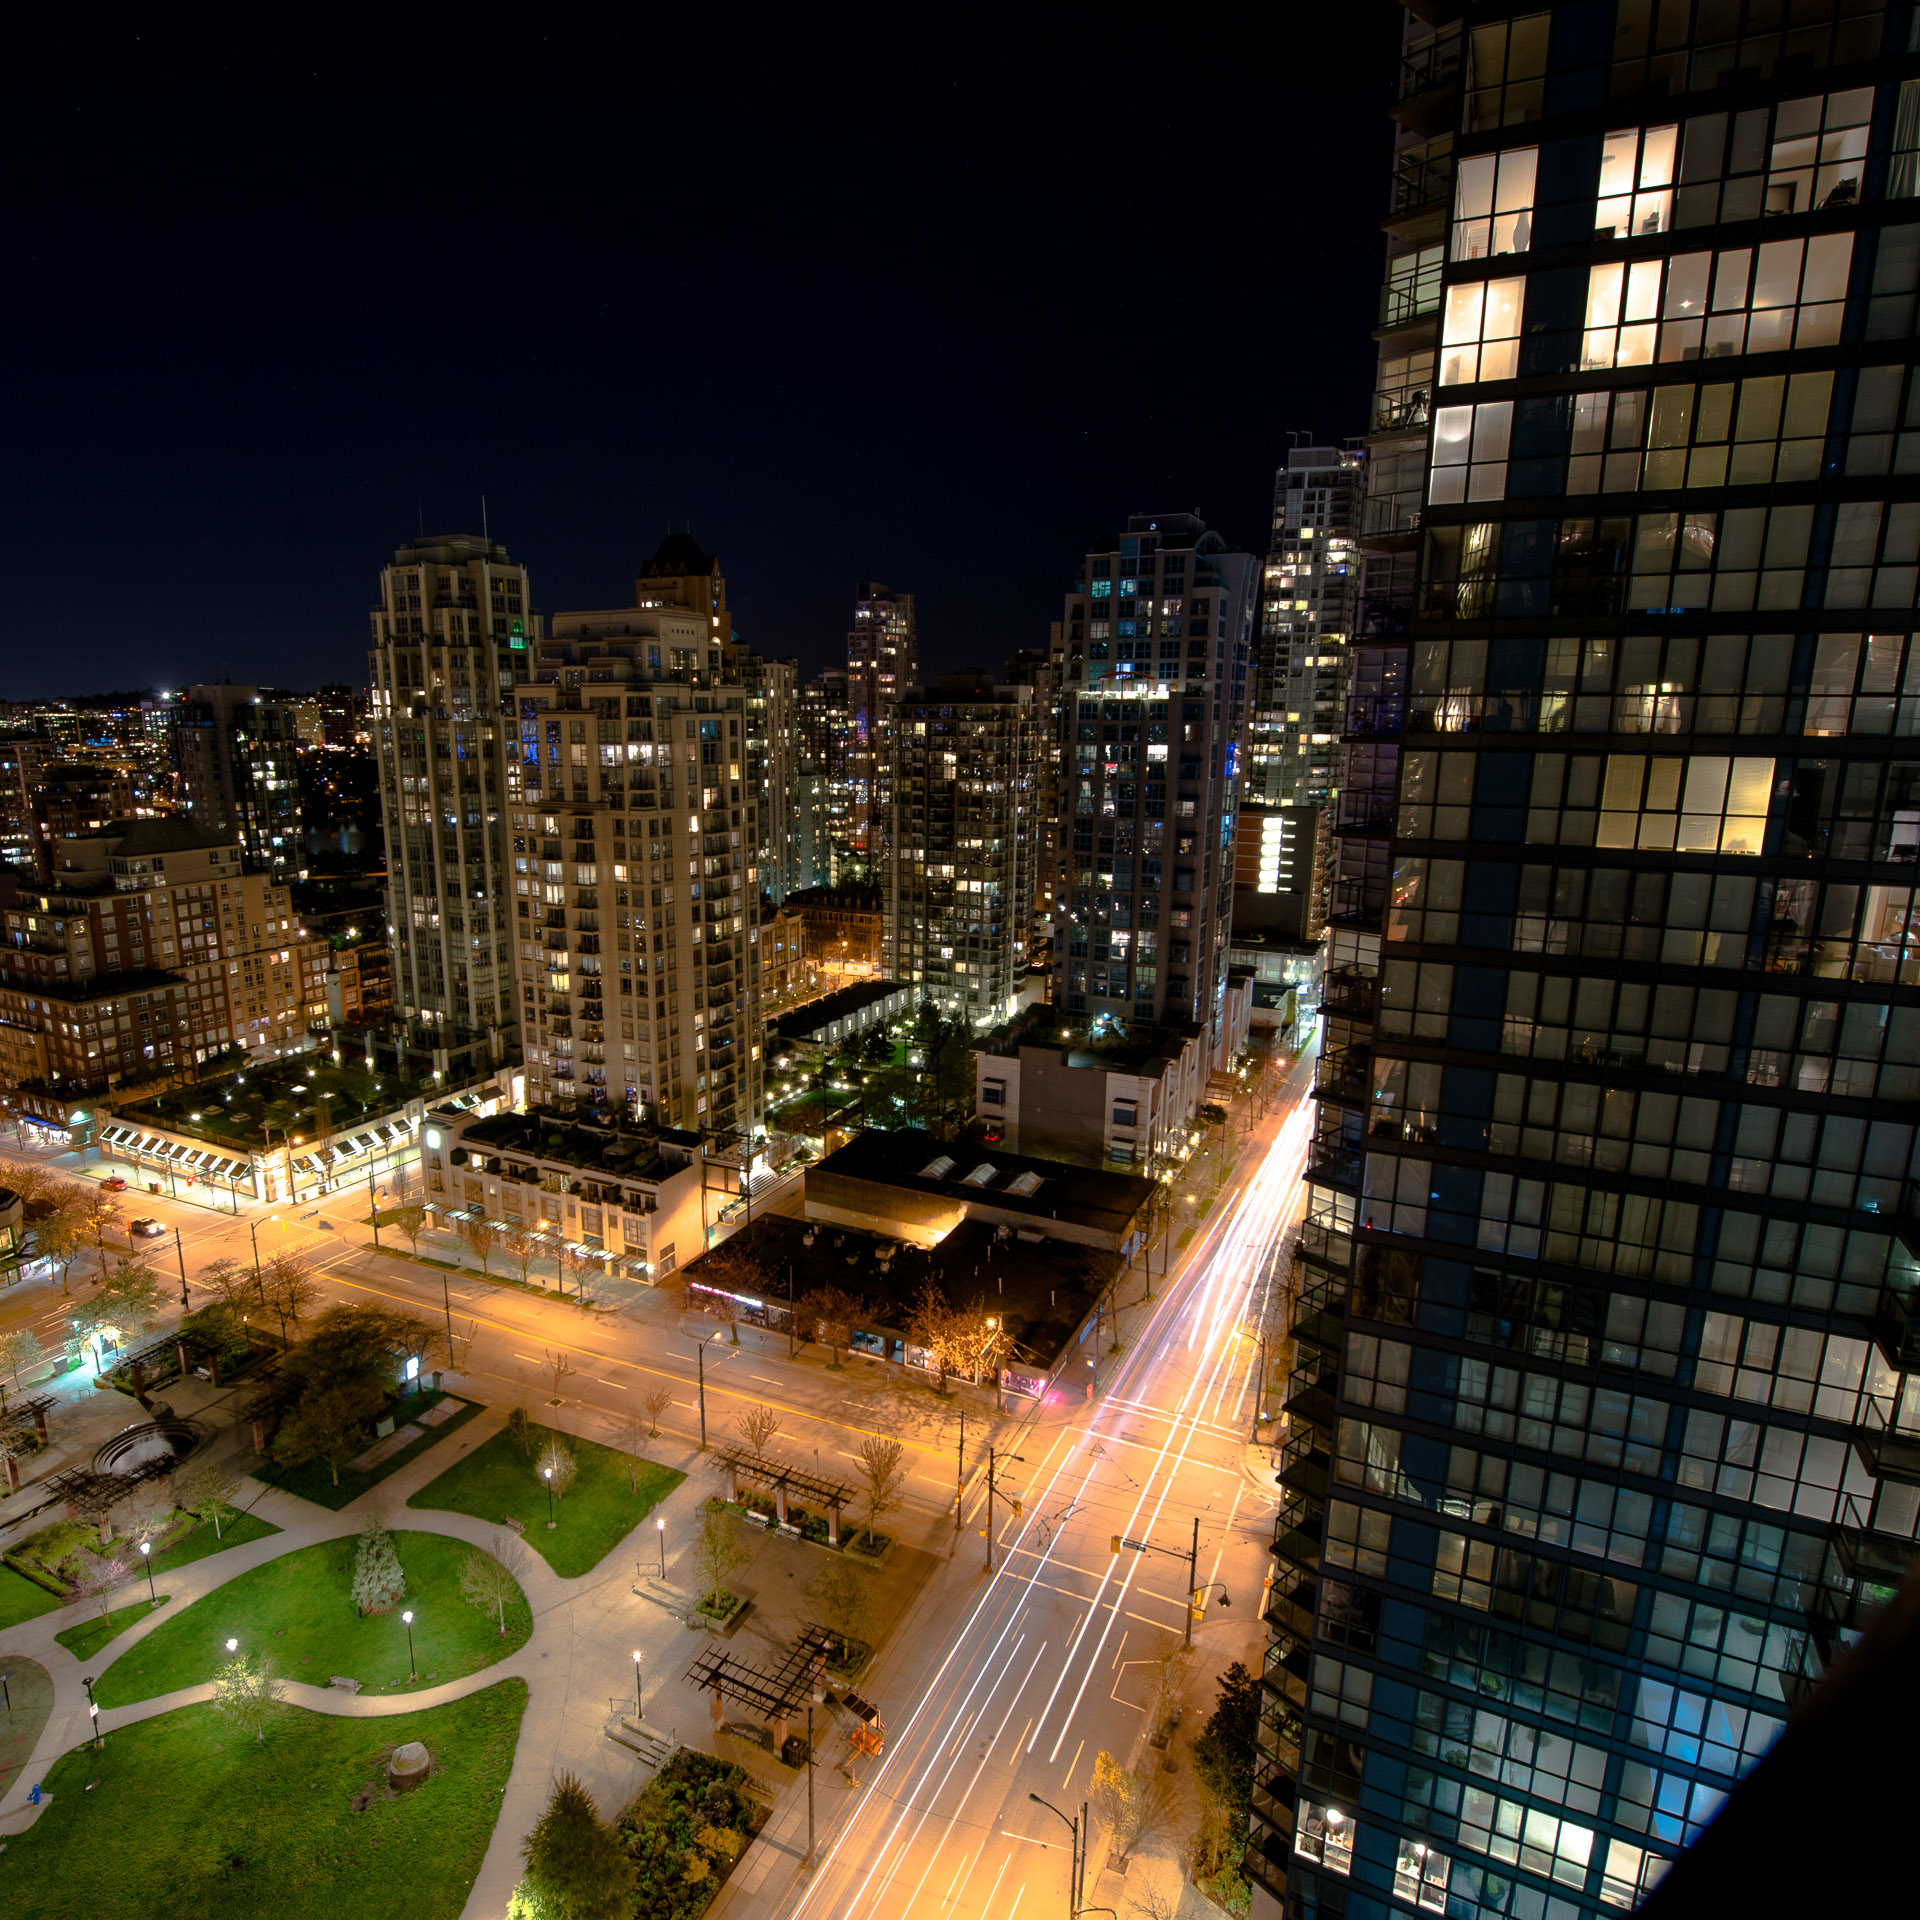 Vancouver-BC_Hi-Rise-Balcony_Sirens_Night.jpg